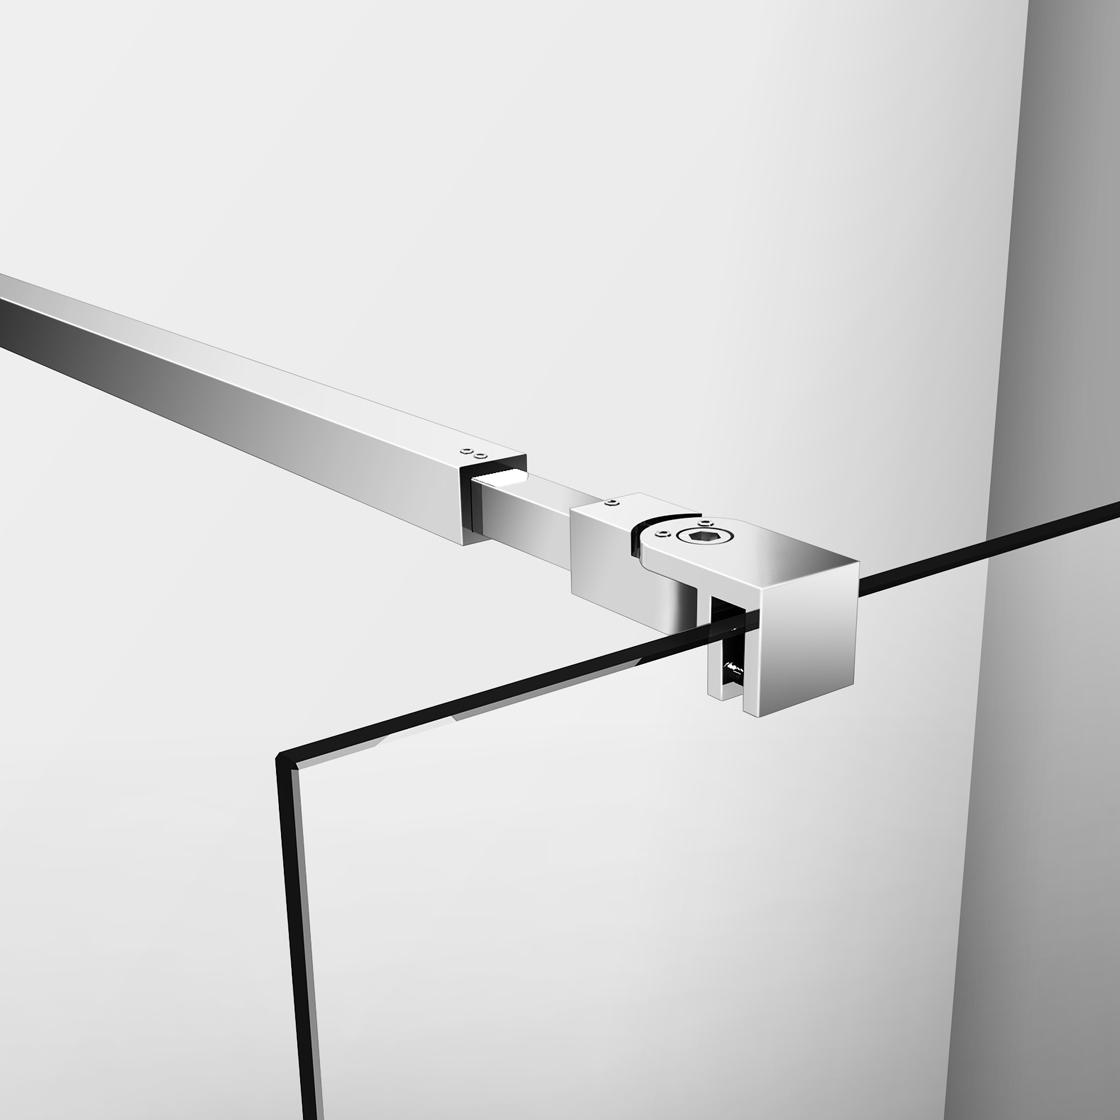 800x1950mm Wet Room Walk In Shower Enclosure Glass Screen